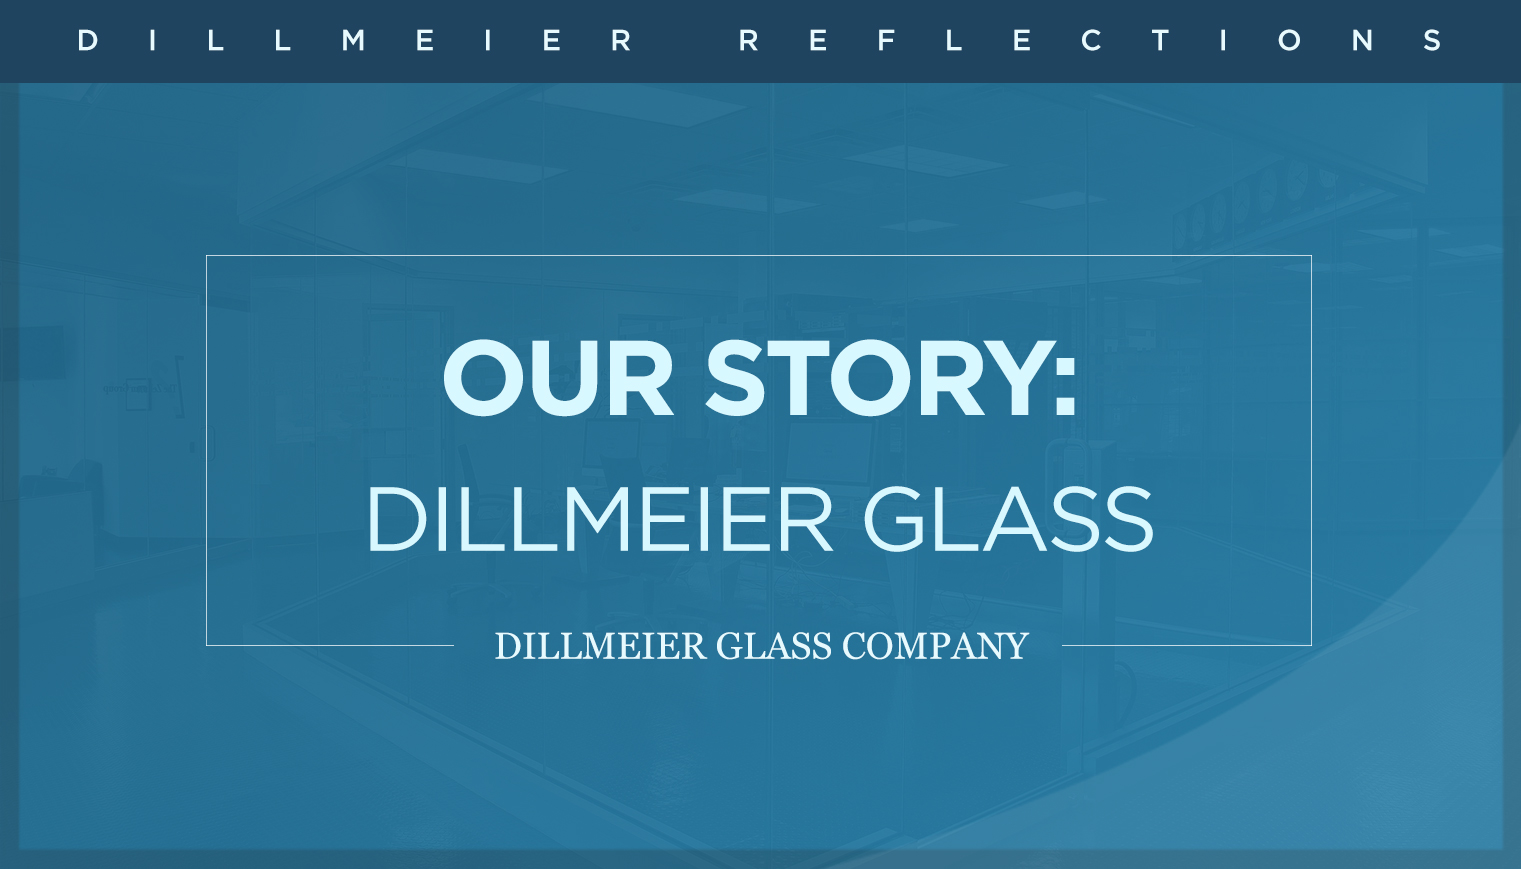 Our Story: Dillmeier Glass